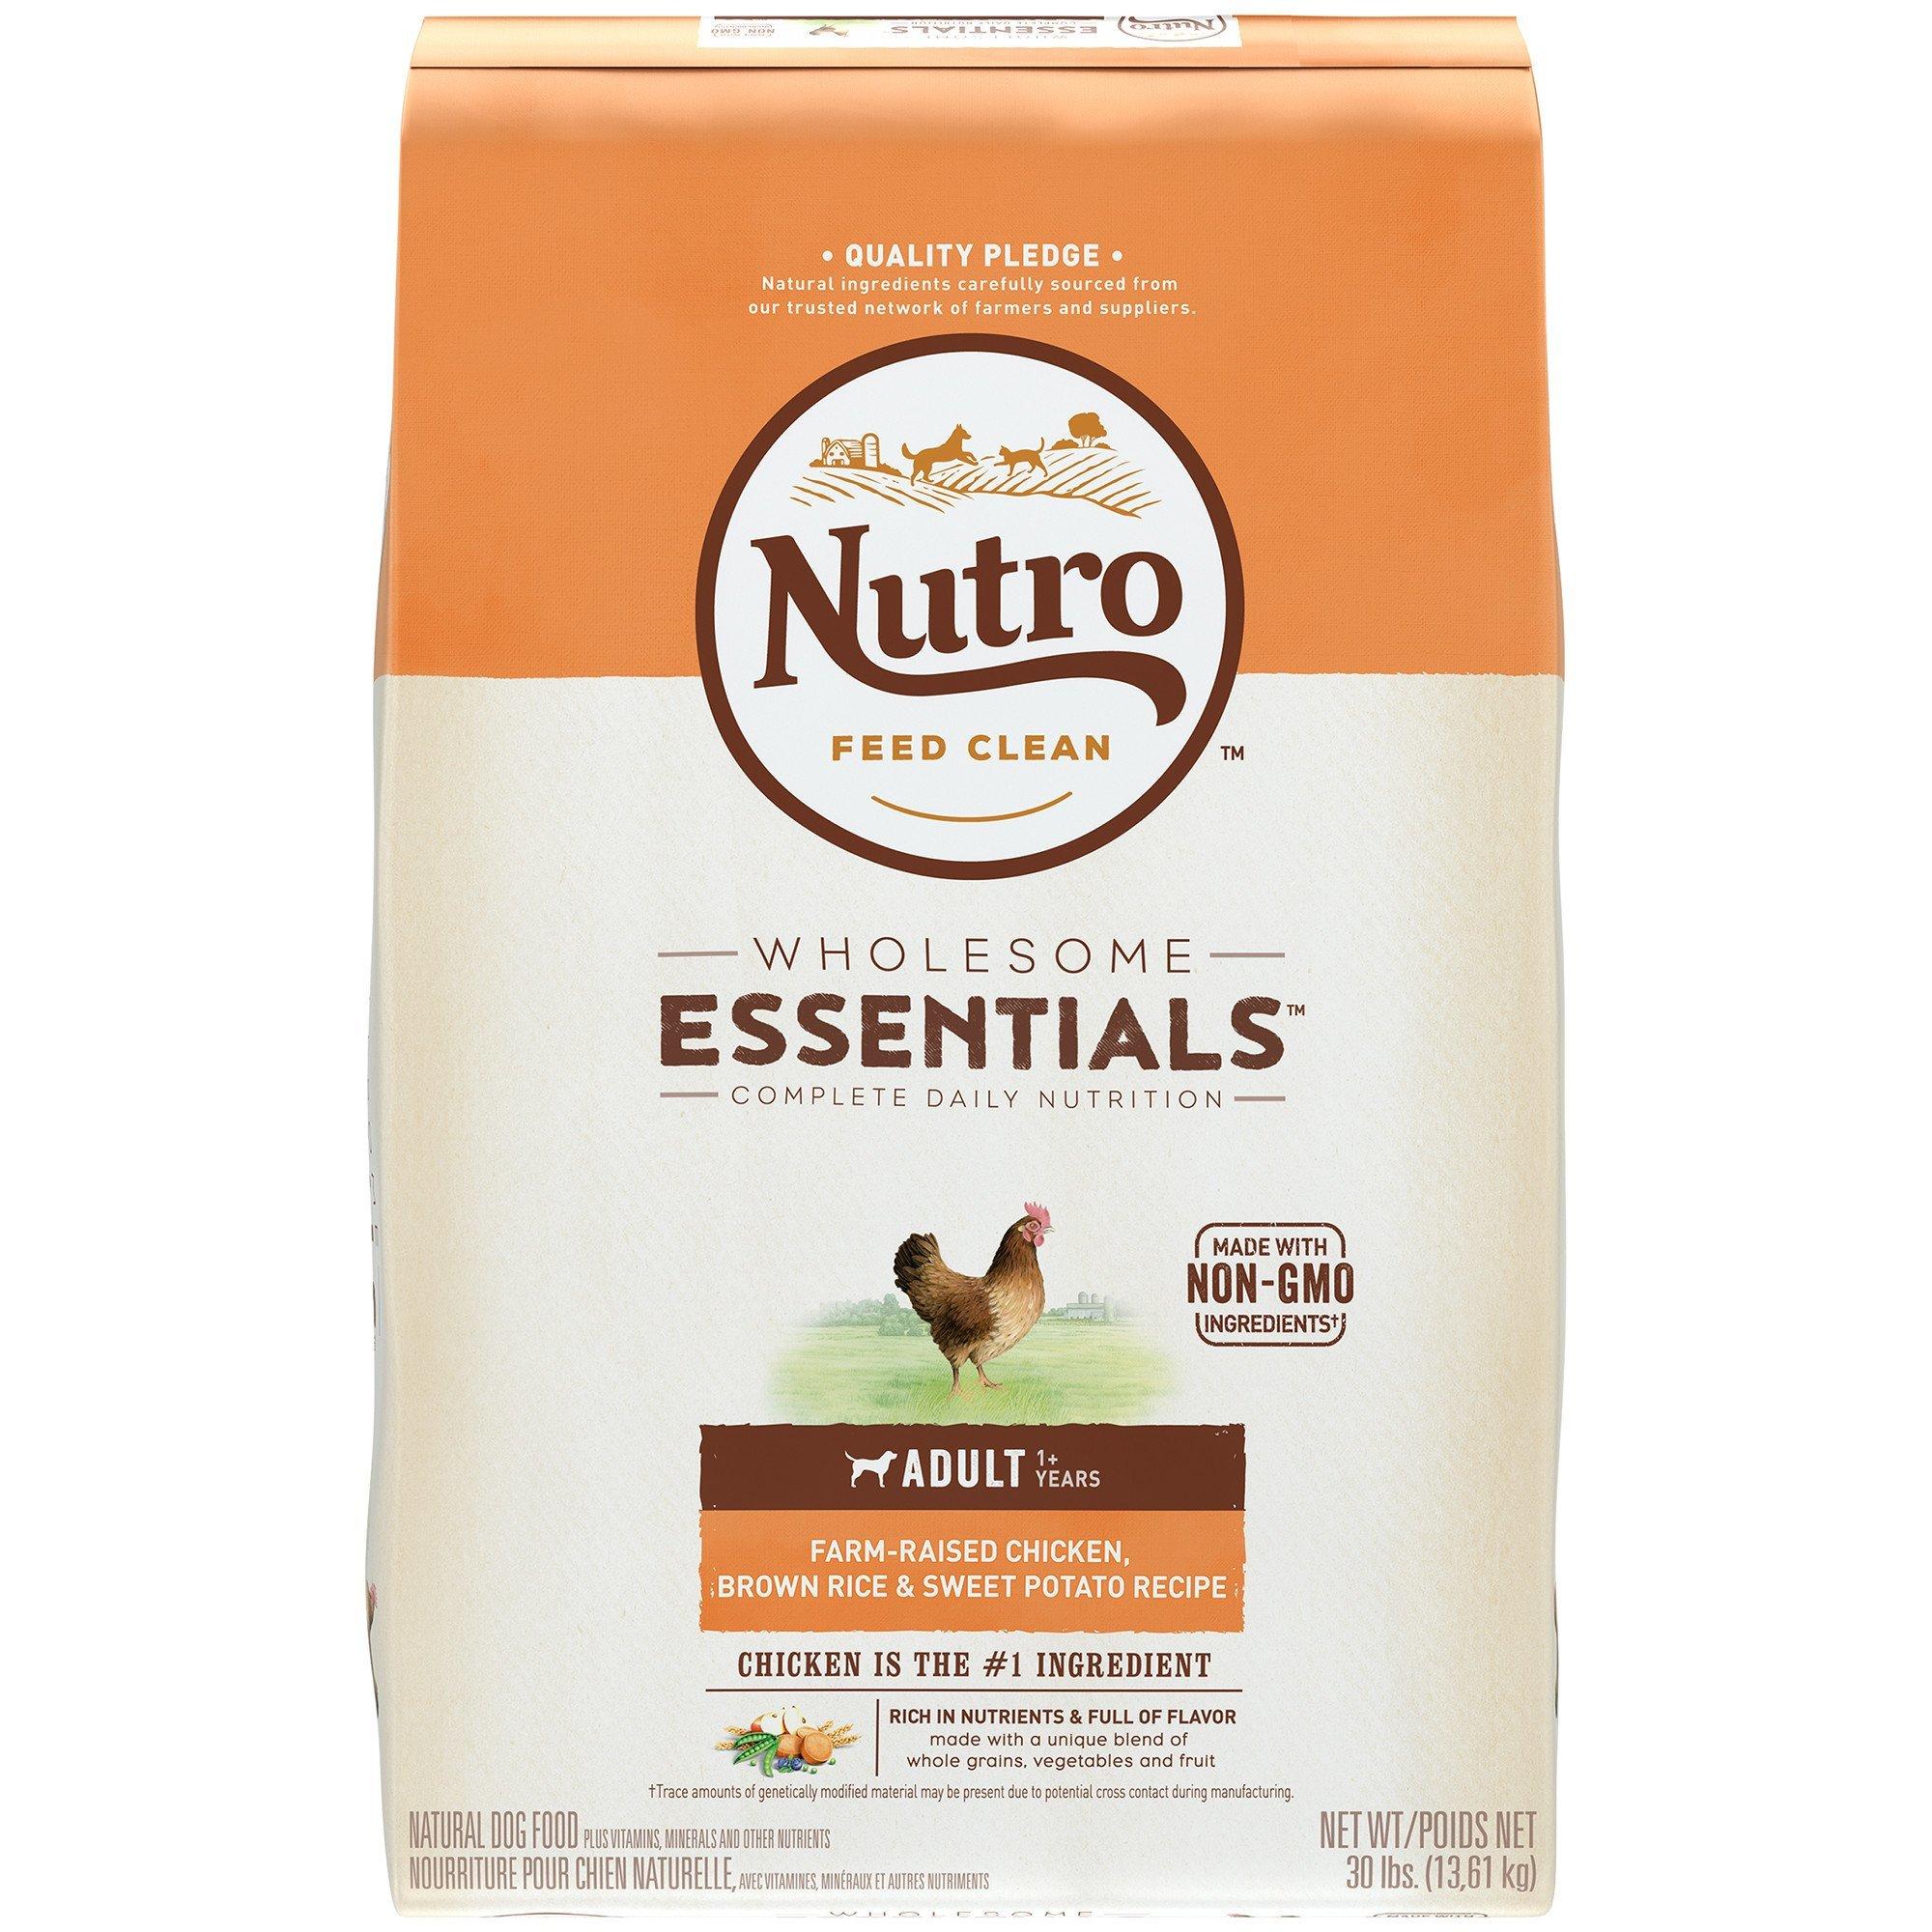 Nutro Essentials Adult Farm Raised Chicken, Brown Rice, and Sweet Potato Formula Dry Dog Food 5lbs-15lbs 00084